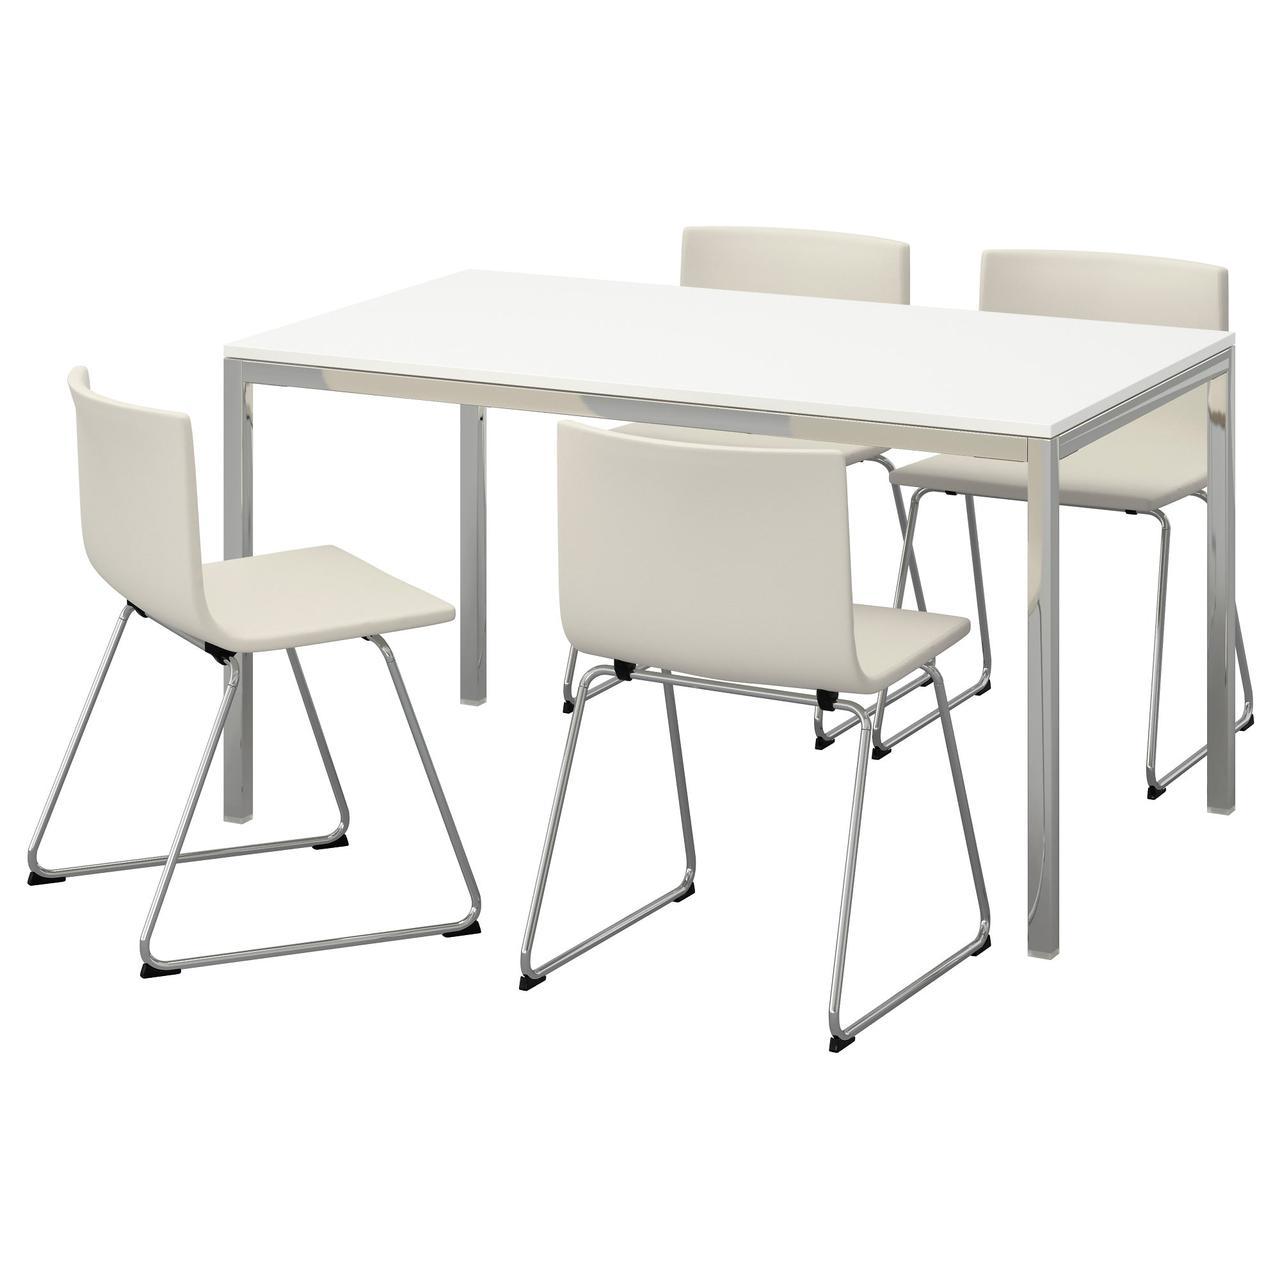 ТОРСБИ / БЕРНГАРД Стол и 4 стула, глянцевый белый, Кават белый